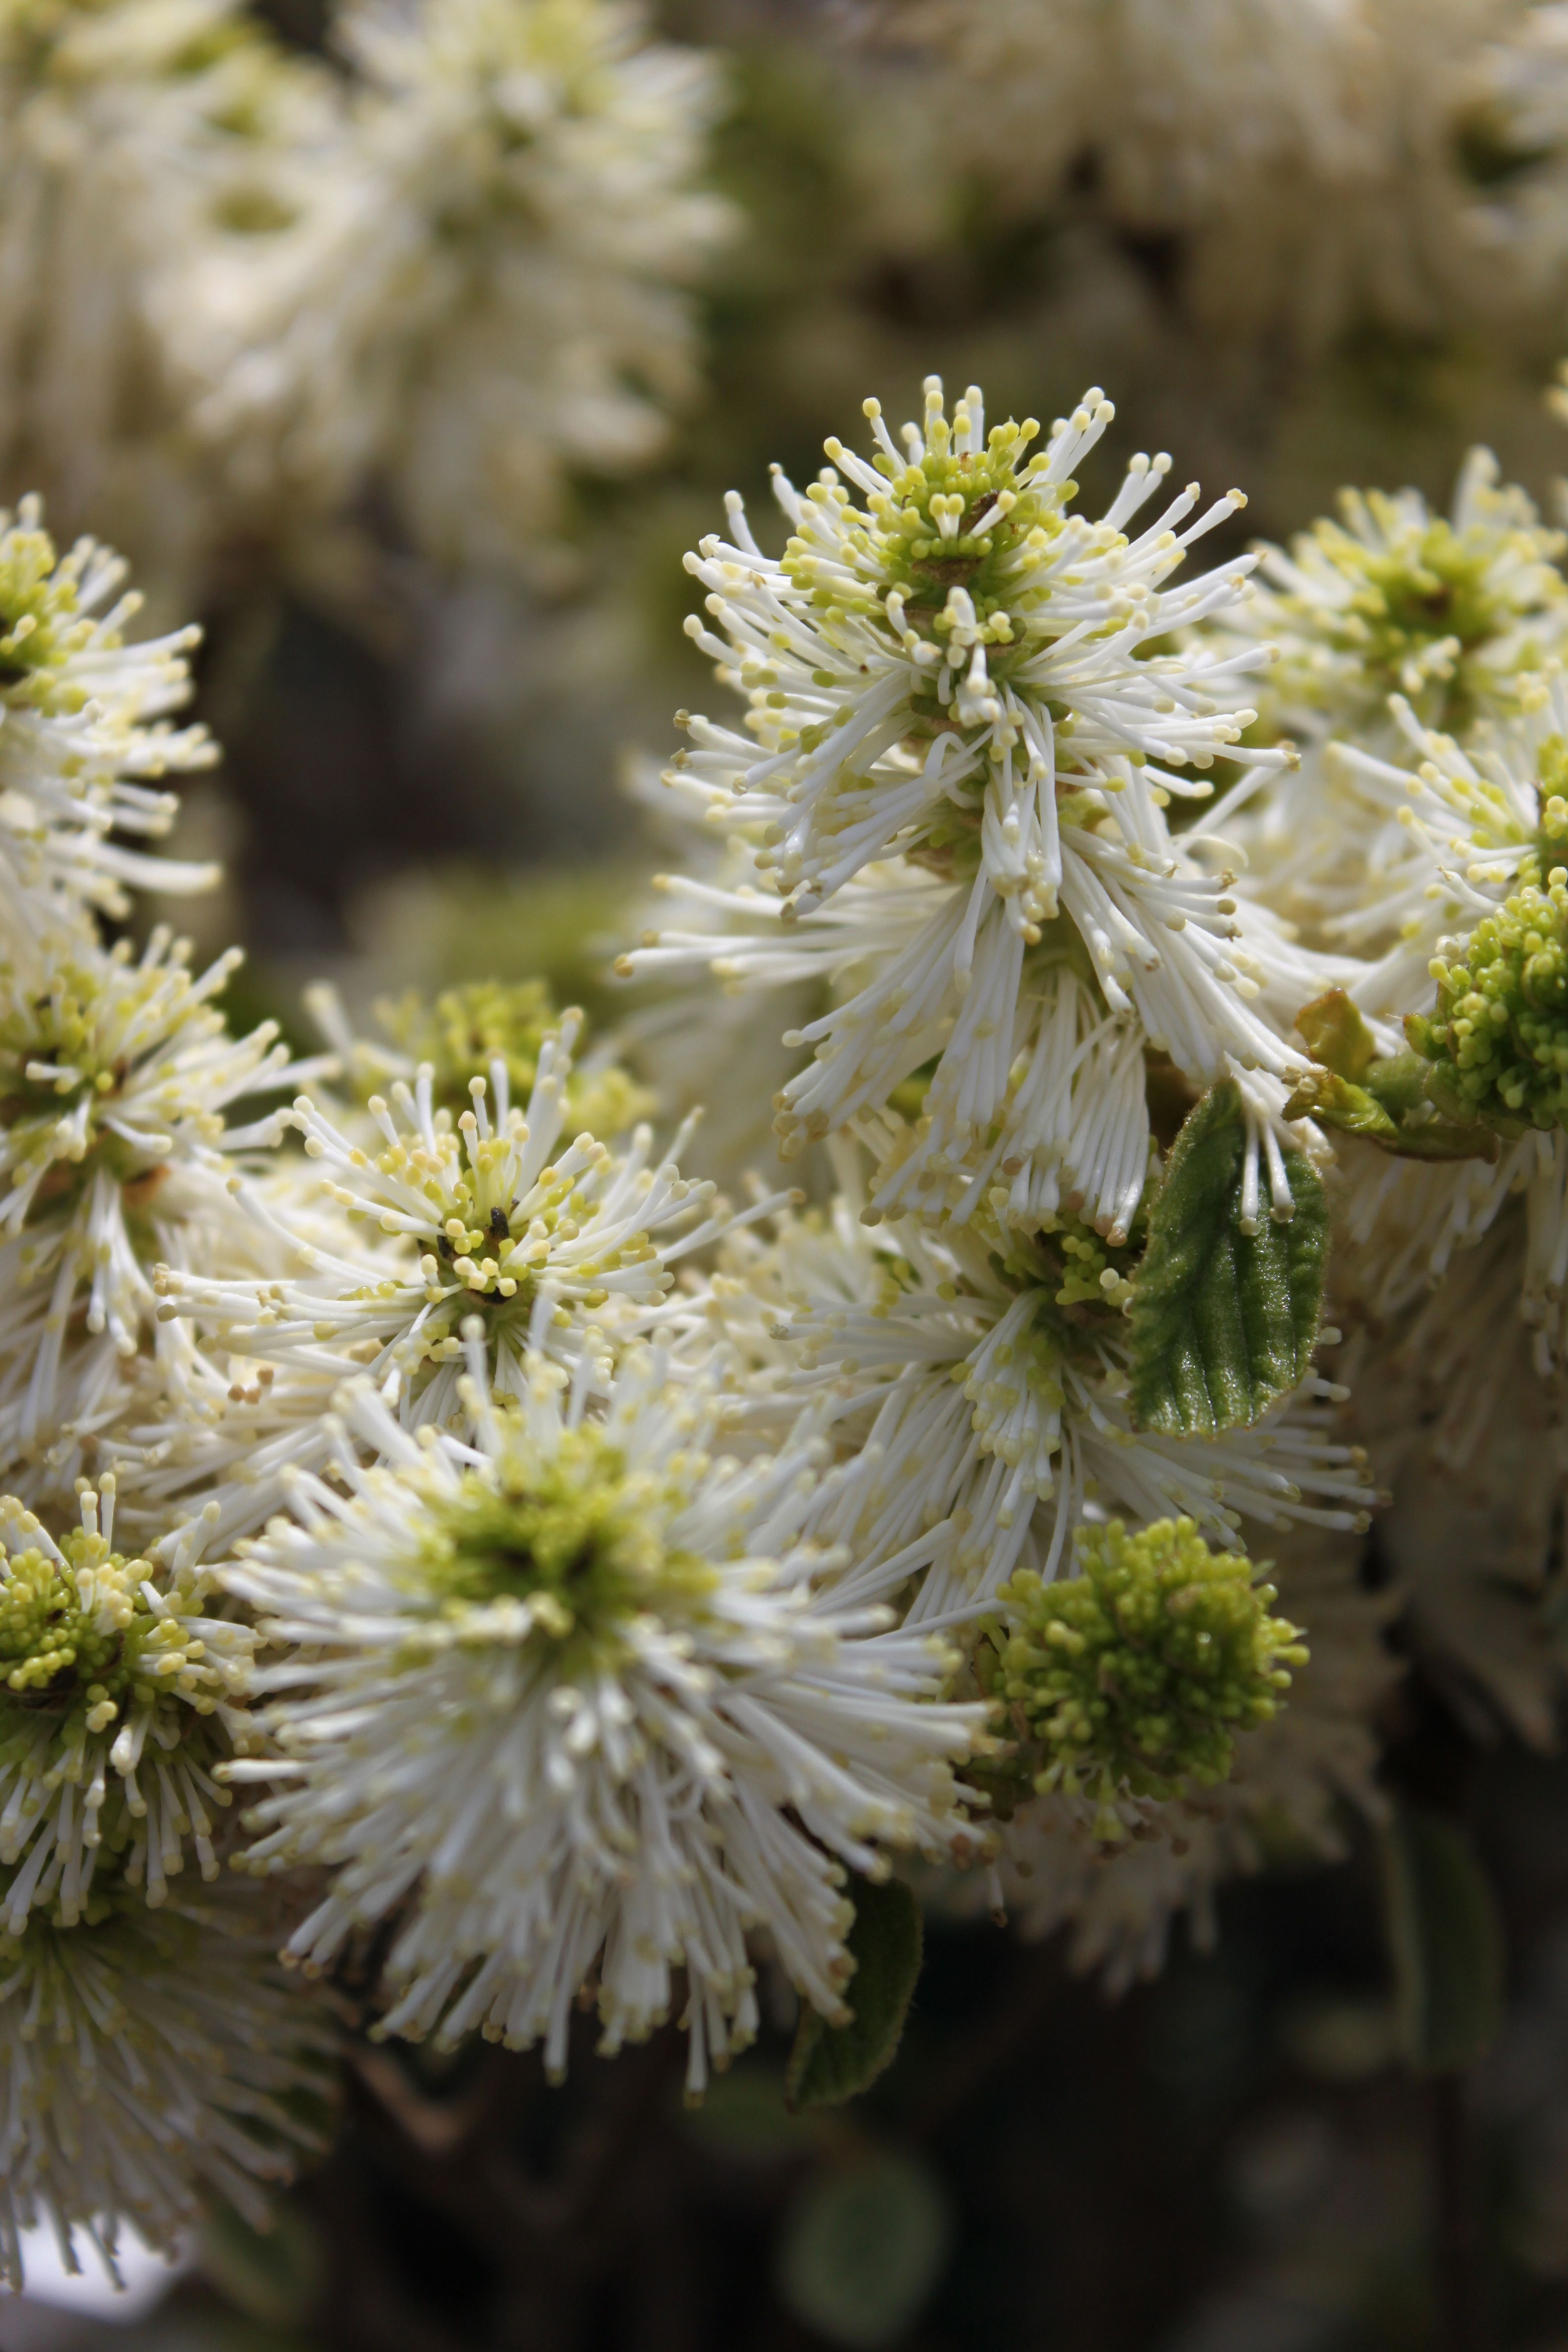 Dwarf Fothergilla Fothergilla A Small Spring Blooming Shrub With